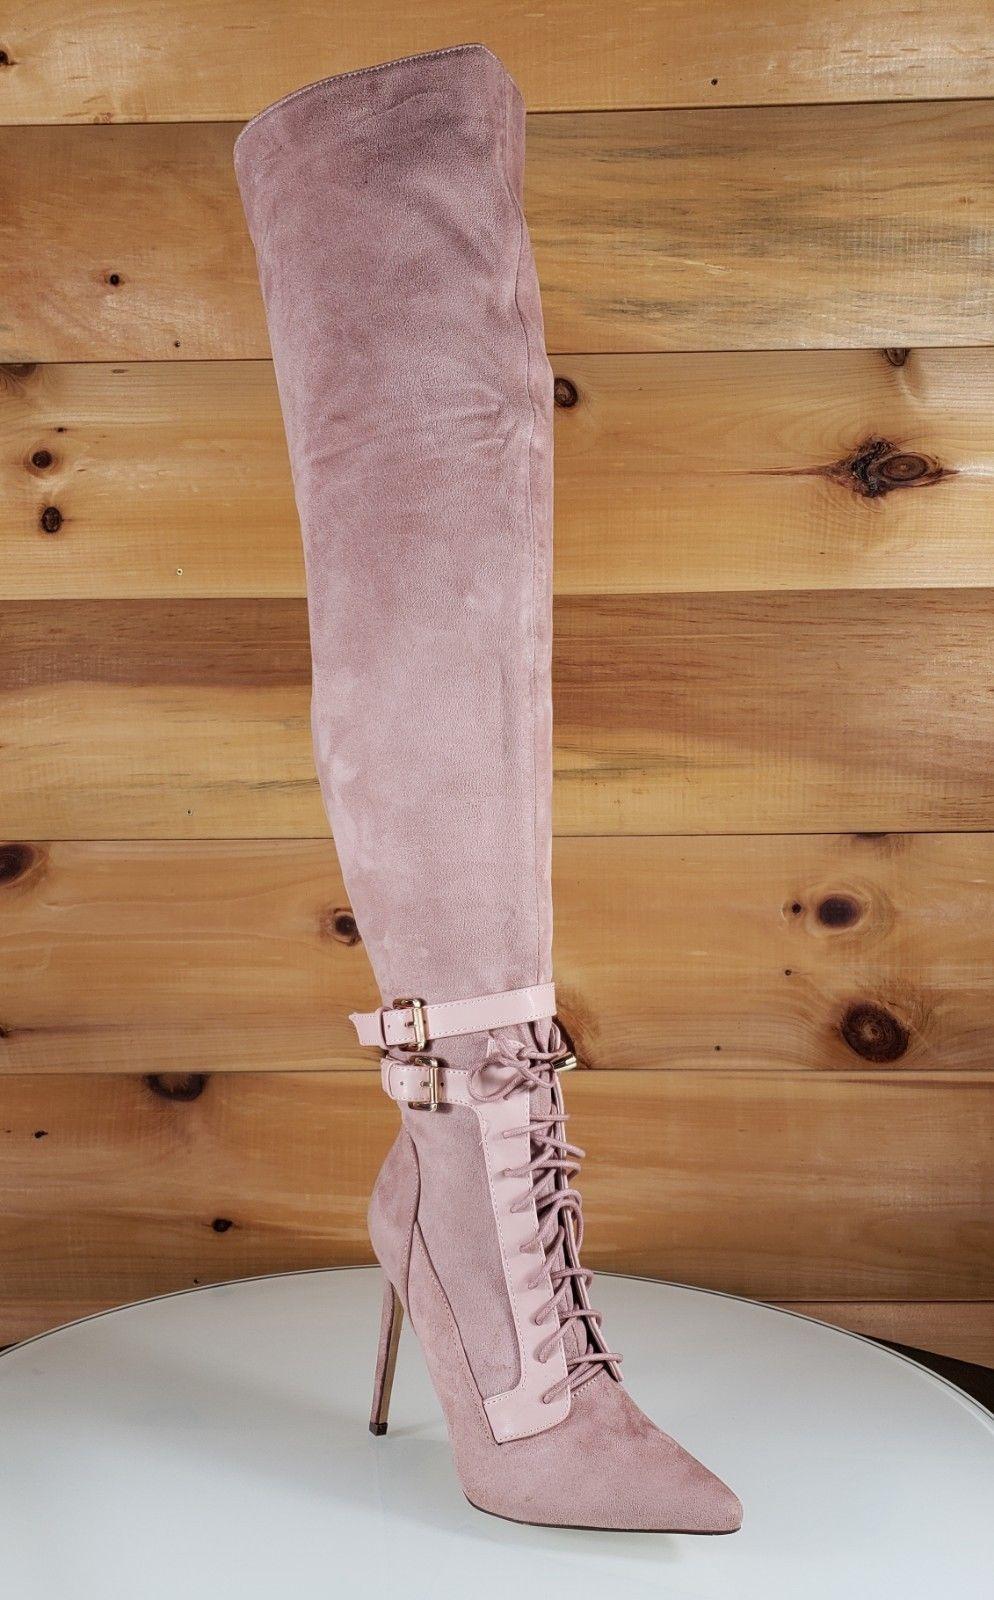 98cb19ddf068 So Me Ashanti Blush Pink Pointy Toe High Heel OTK Above Knee Boots ...